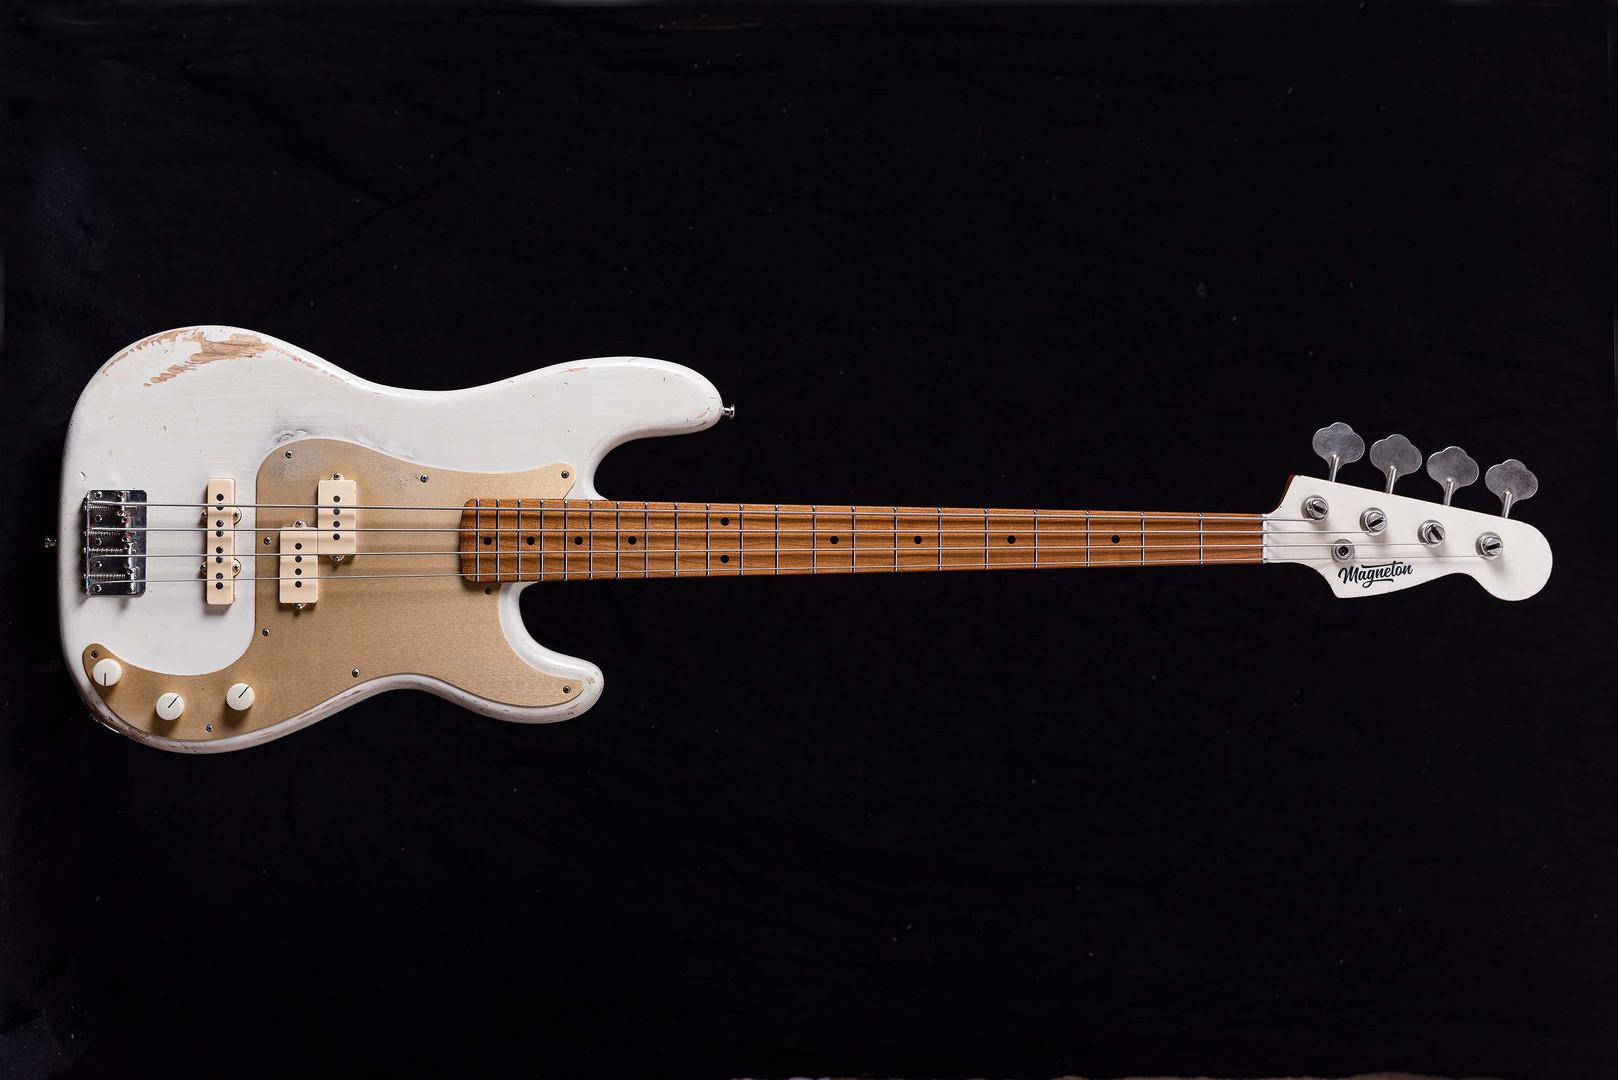 Magneton Priscilla Bass